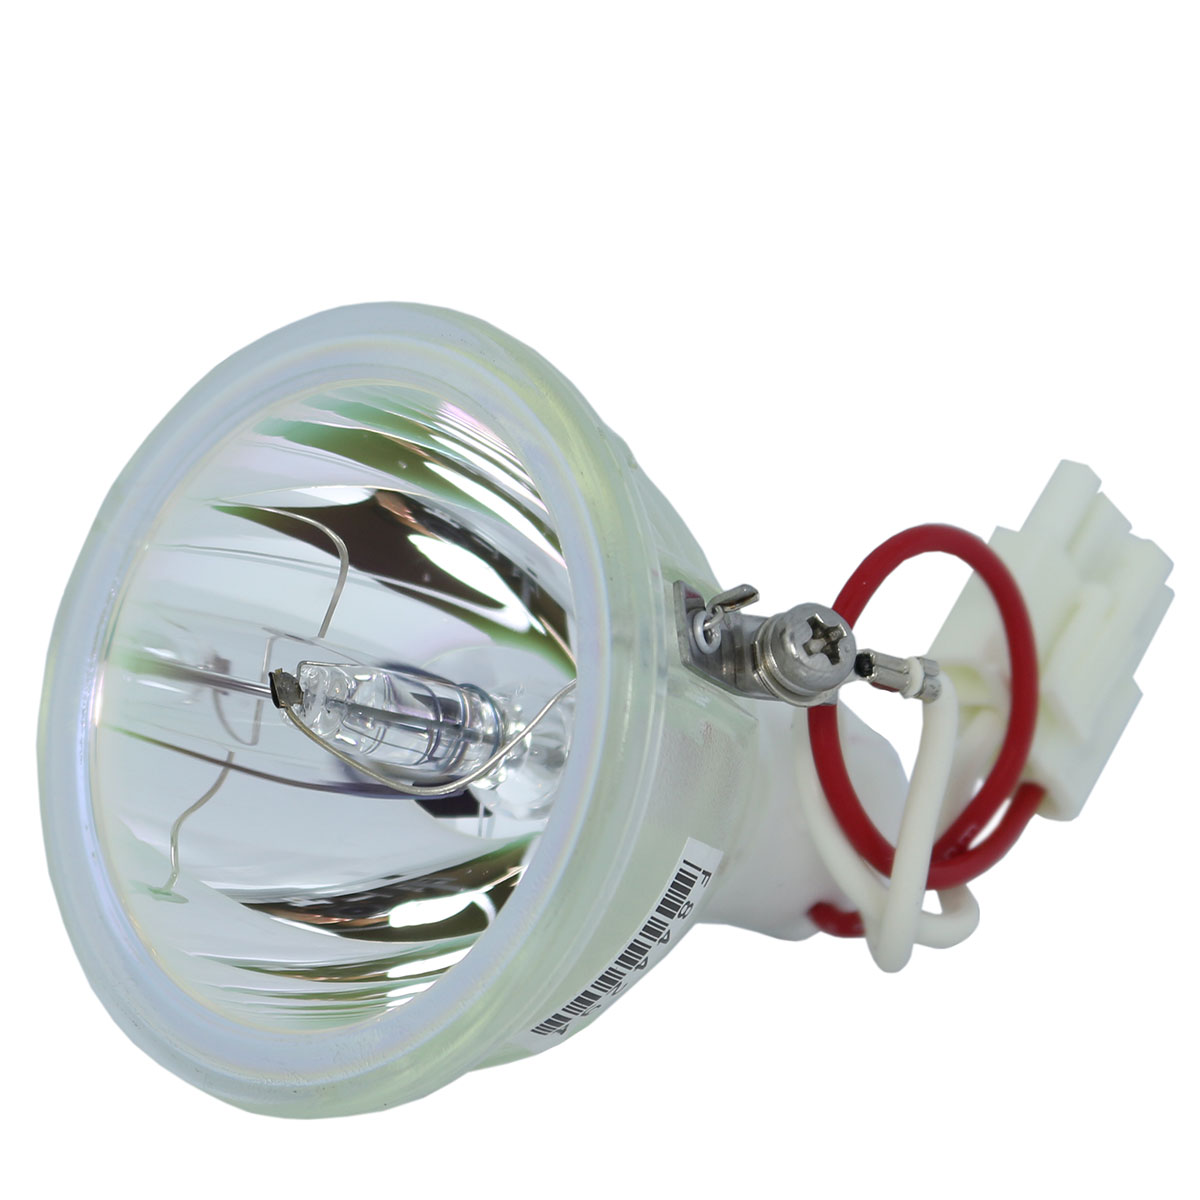 Original Phoenix Projector Lamp Replacement with Housing for Ask Proxima SP-LAMP-018 - image 5 de 5